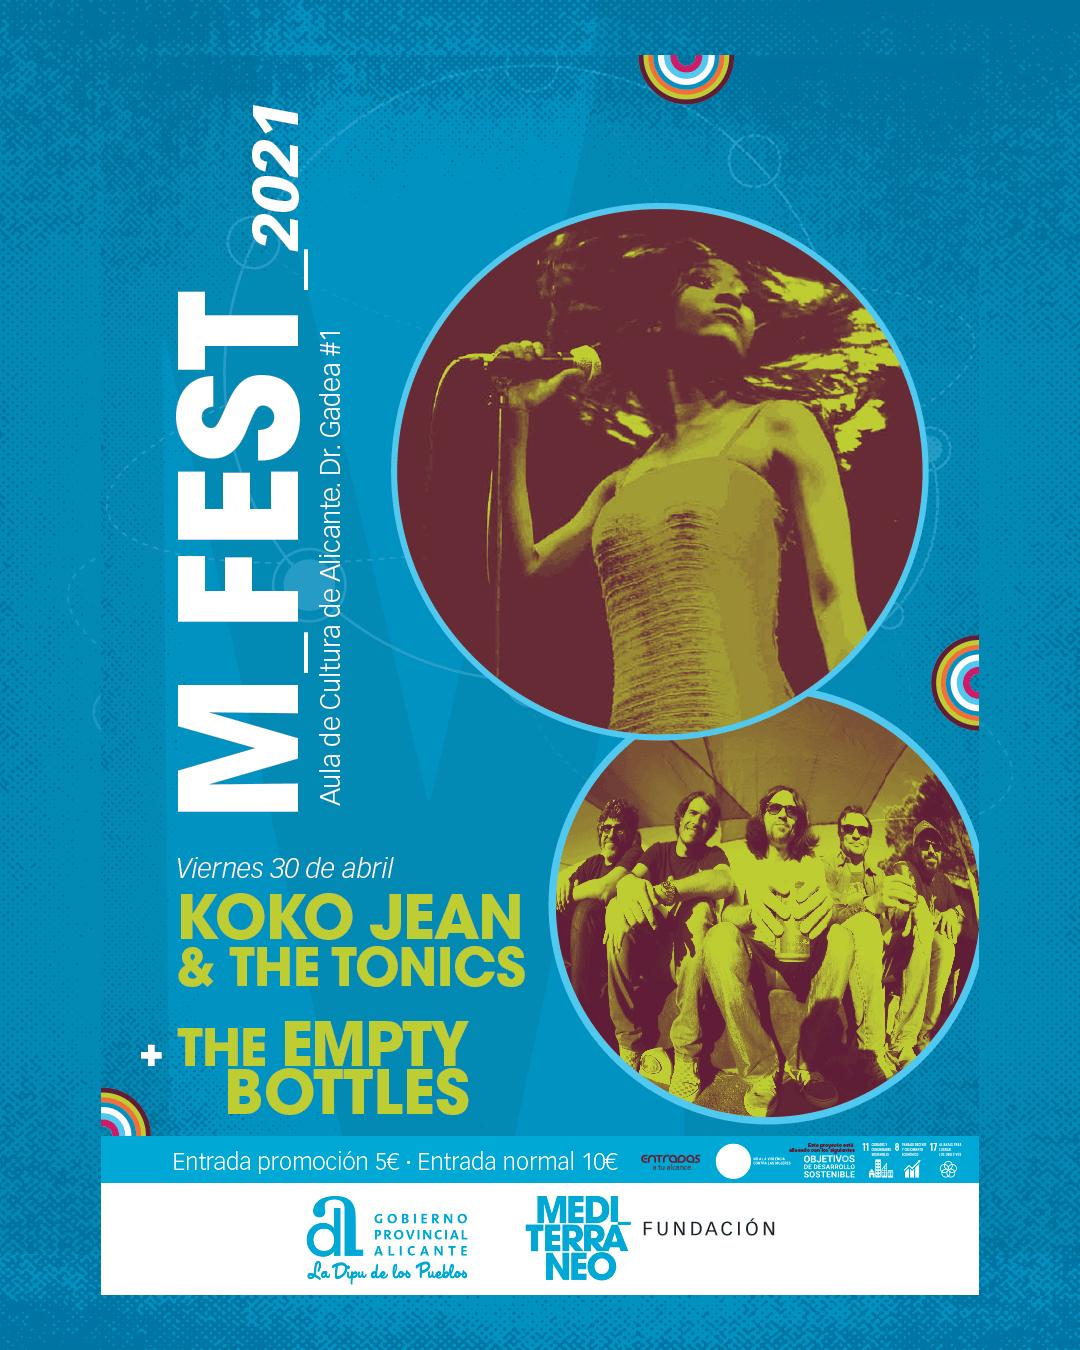 koko-jean-and-the-tonics-the-empty-bottles-602e54d8de206.png